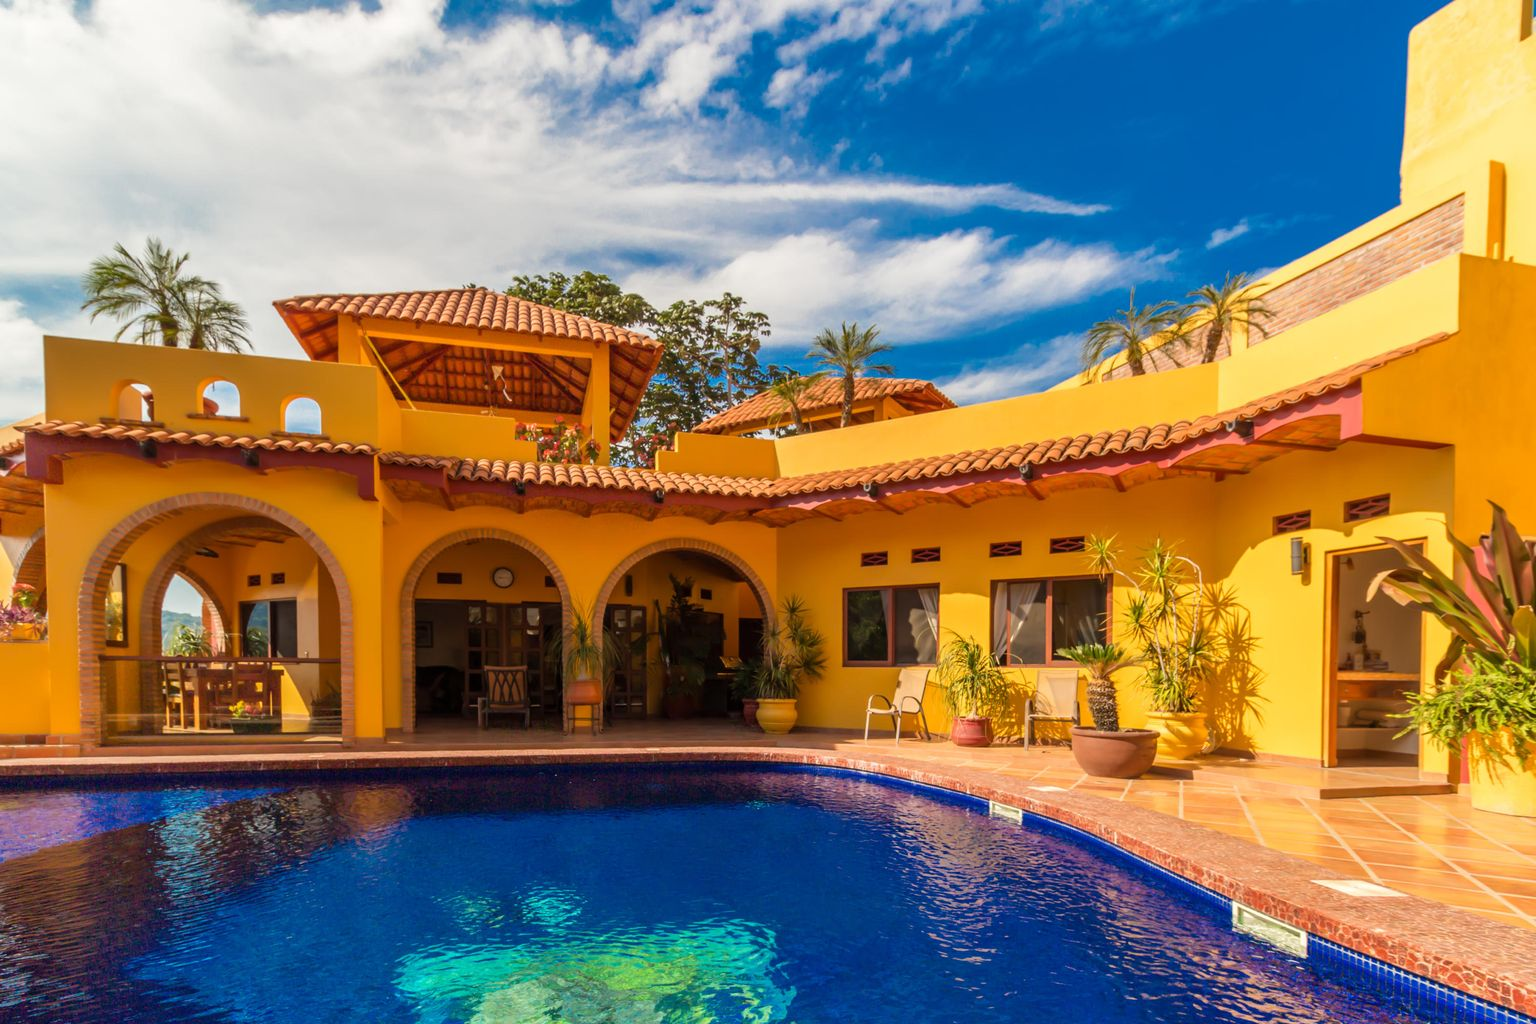 Casa tesoro los ayala for Hotel villas corona en los ayala nayarit